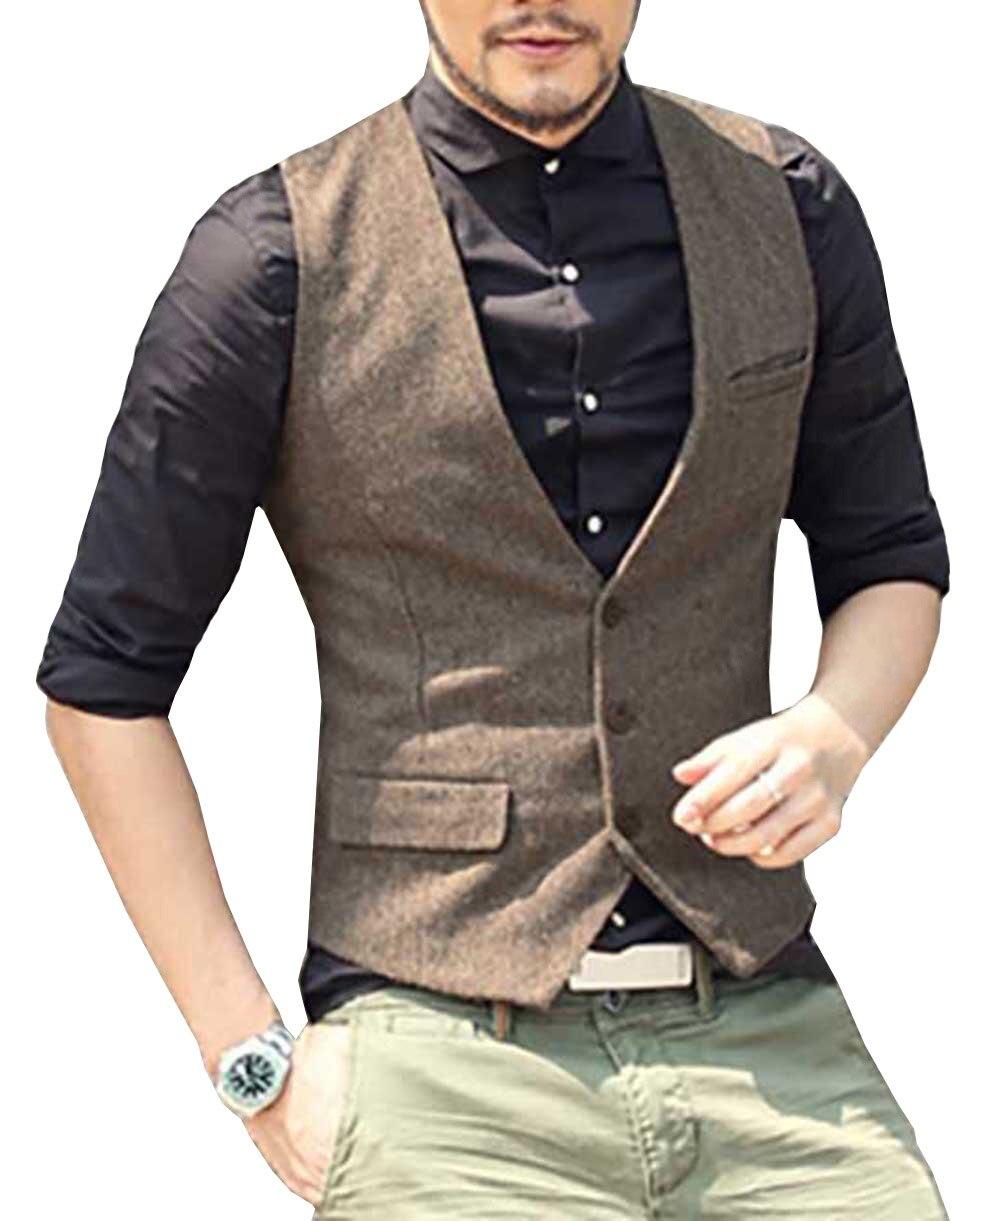 Mens Suit Vest V Neck Wool Brown Grey Formal Single-breasted Waistcoat Casual Business Groomman For Wedding Slim Fit Vest